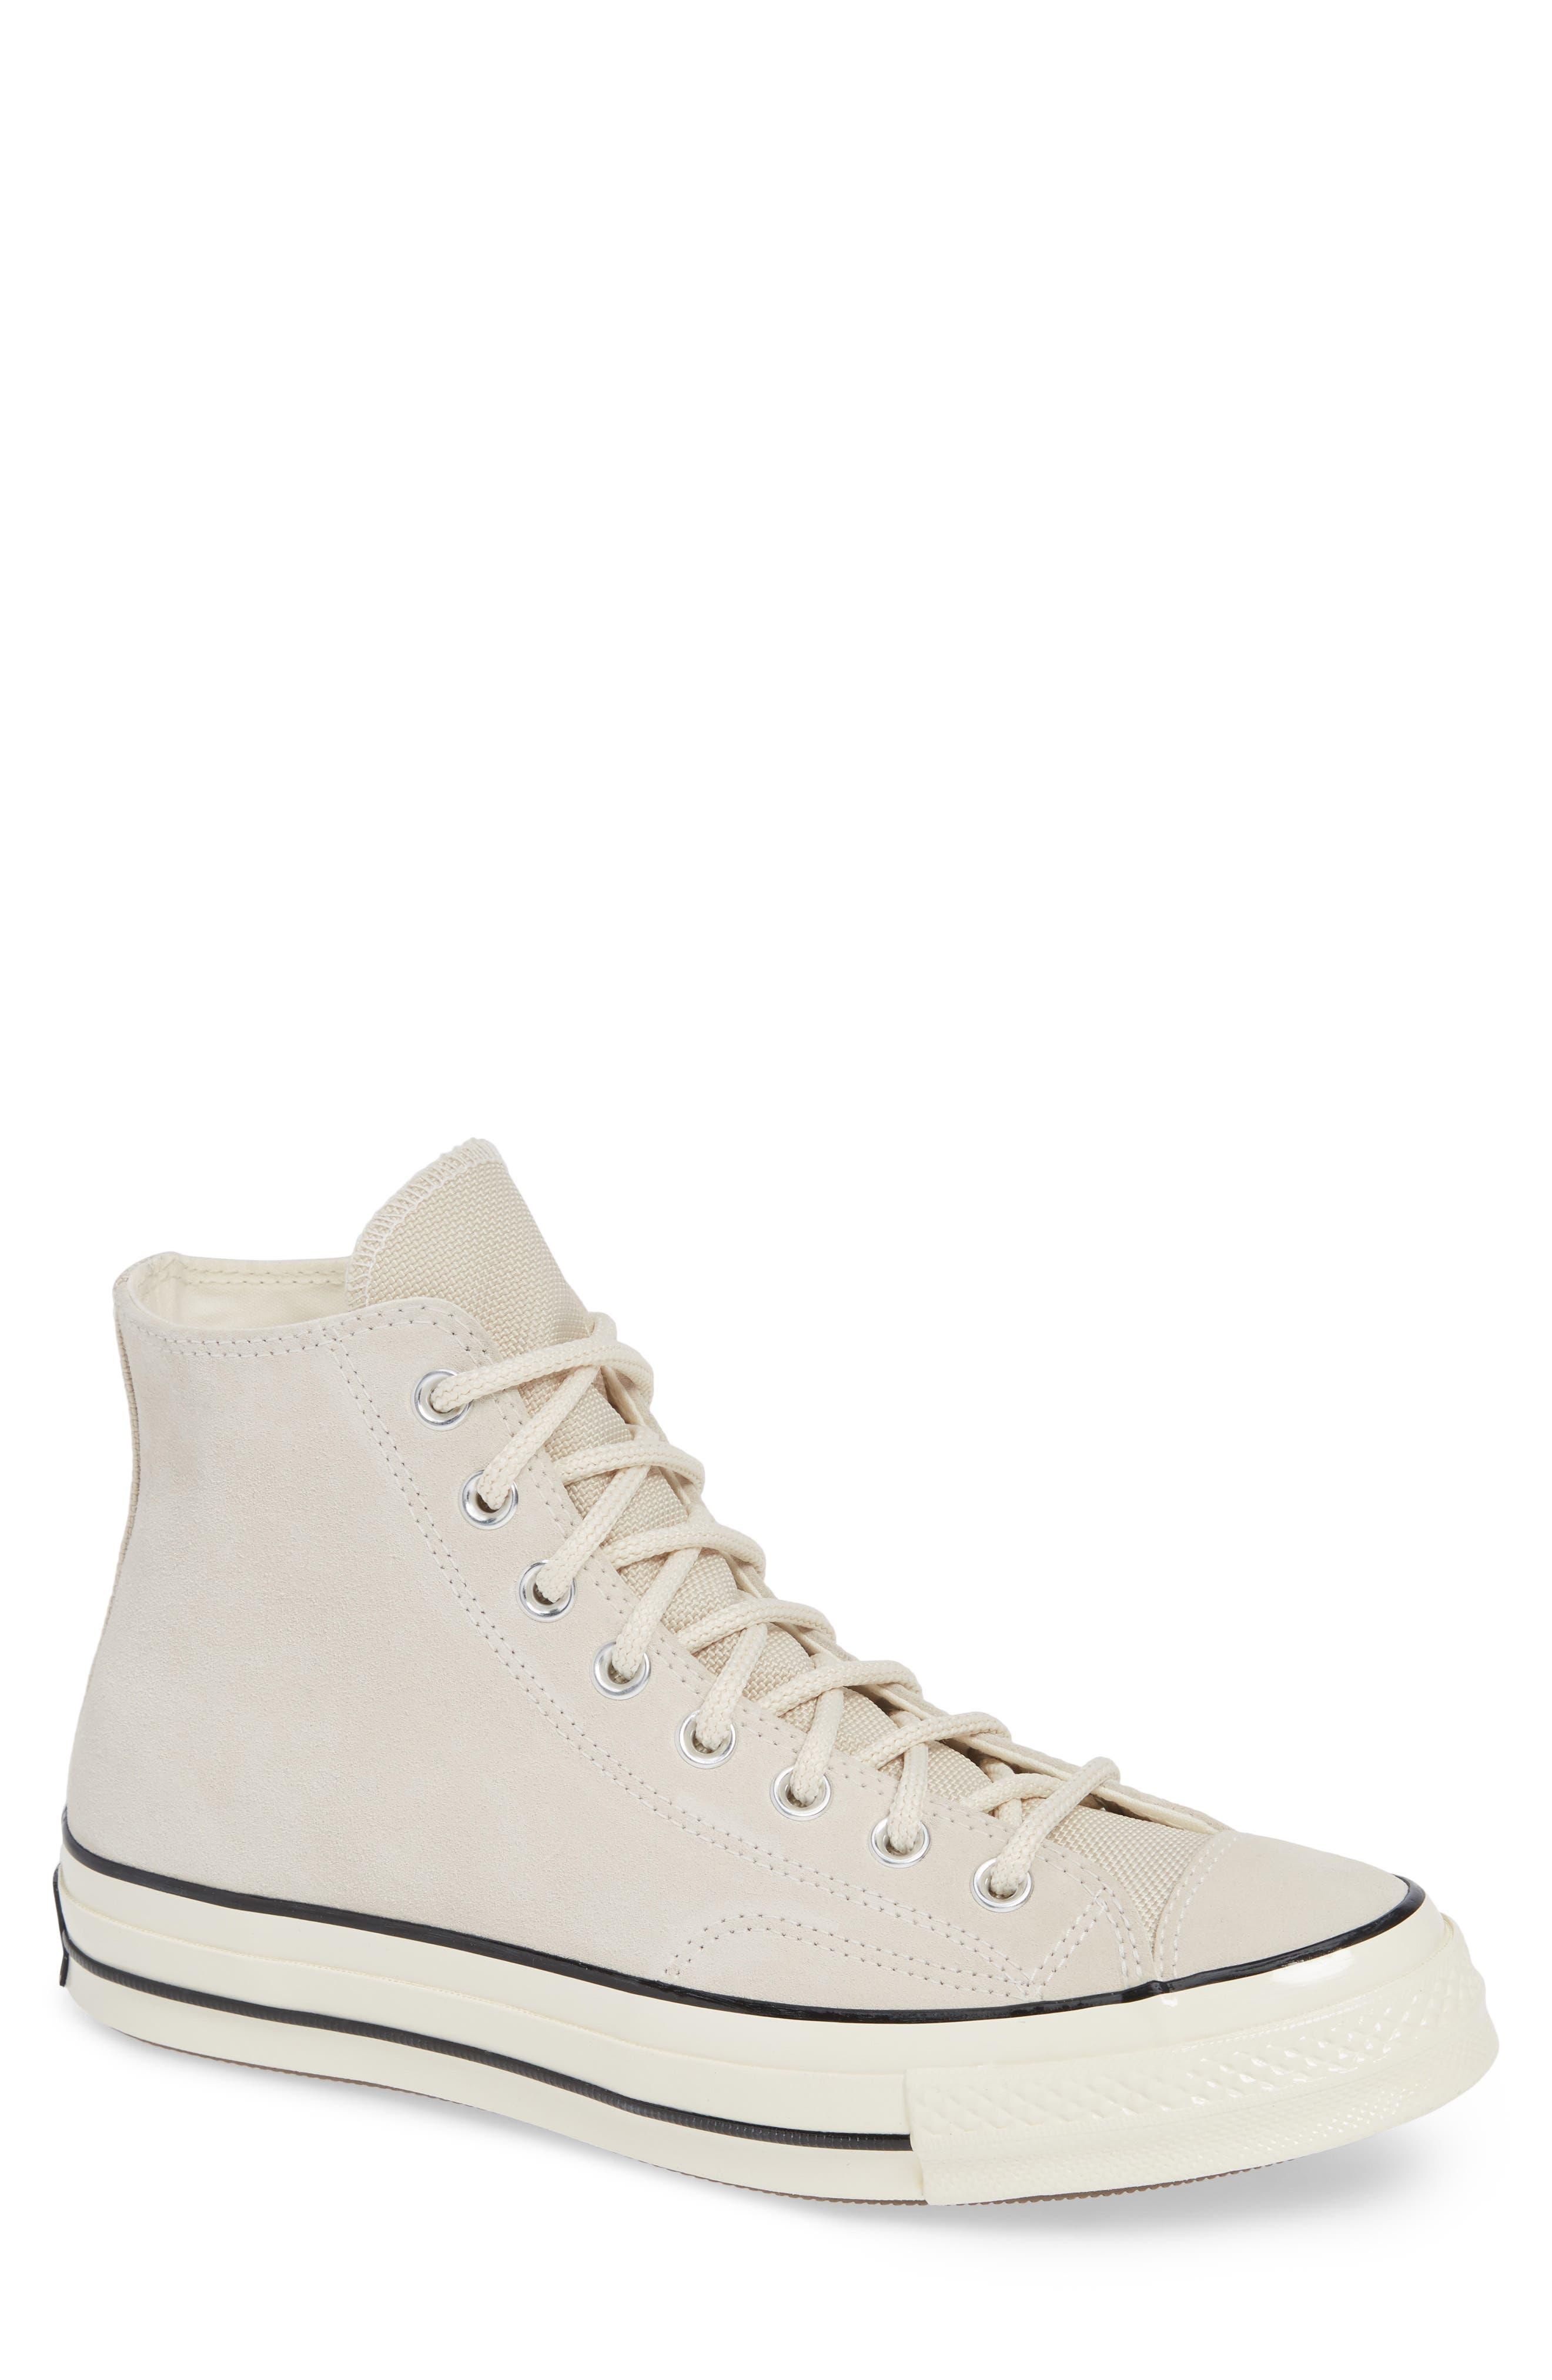 Chuck Taylor<sup>®</sup> All Star<sup>®</sup> 70 Base Camp High Top Sneaker,                             Main thumbnail 1, color,                             NATURAL IVORY/BLACK